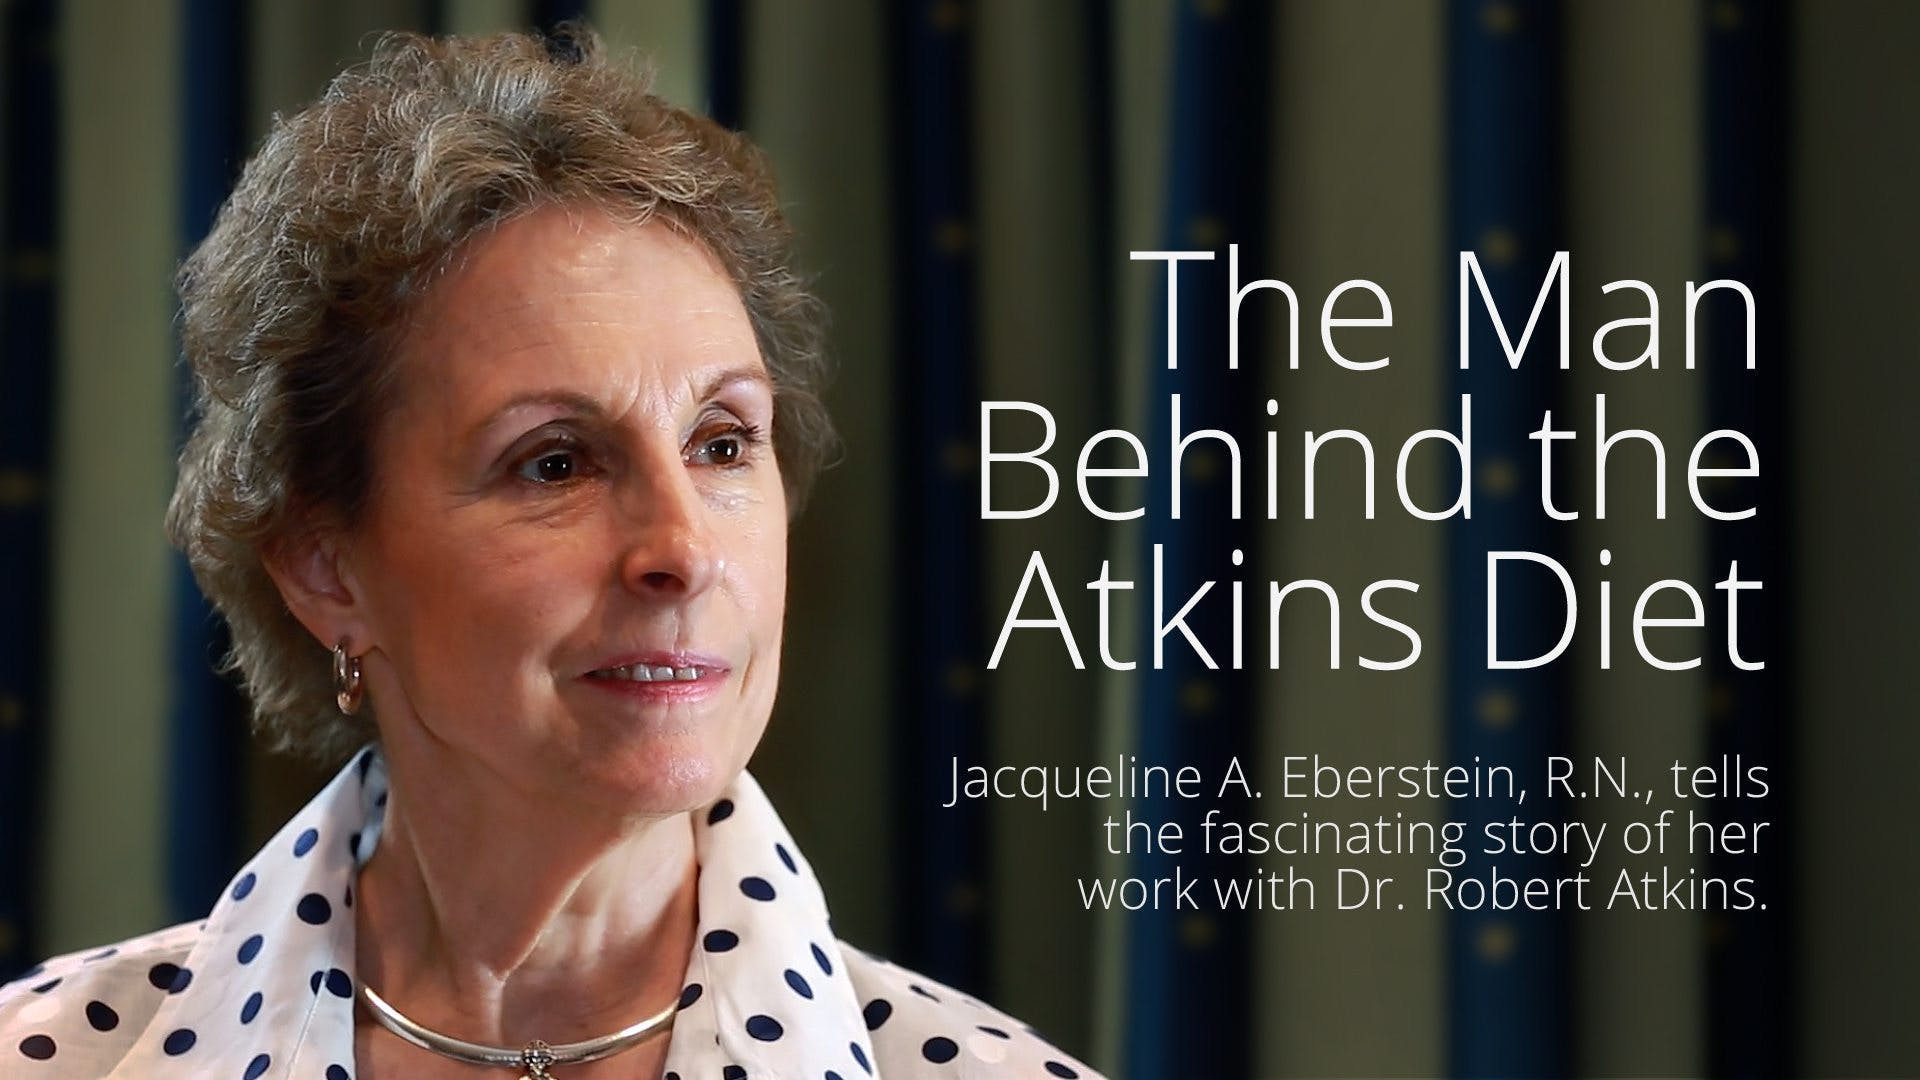 The Man Behind the Atkins Diet – Jackie Eberstein